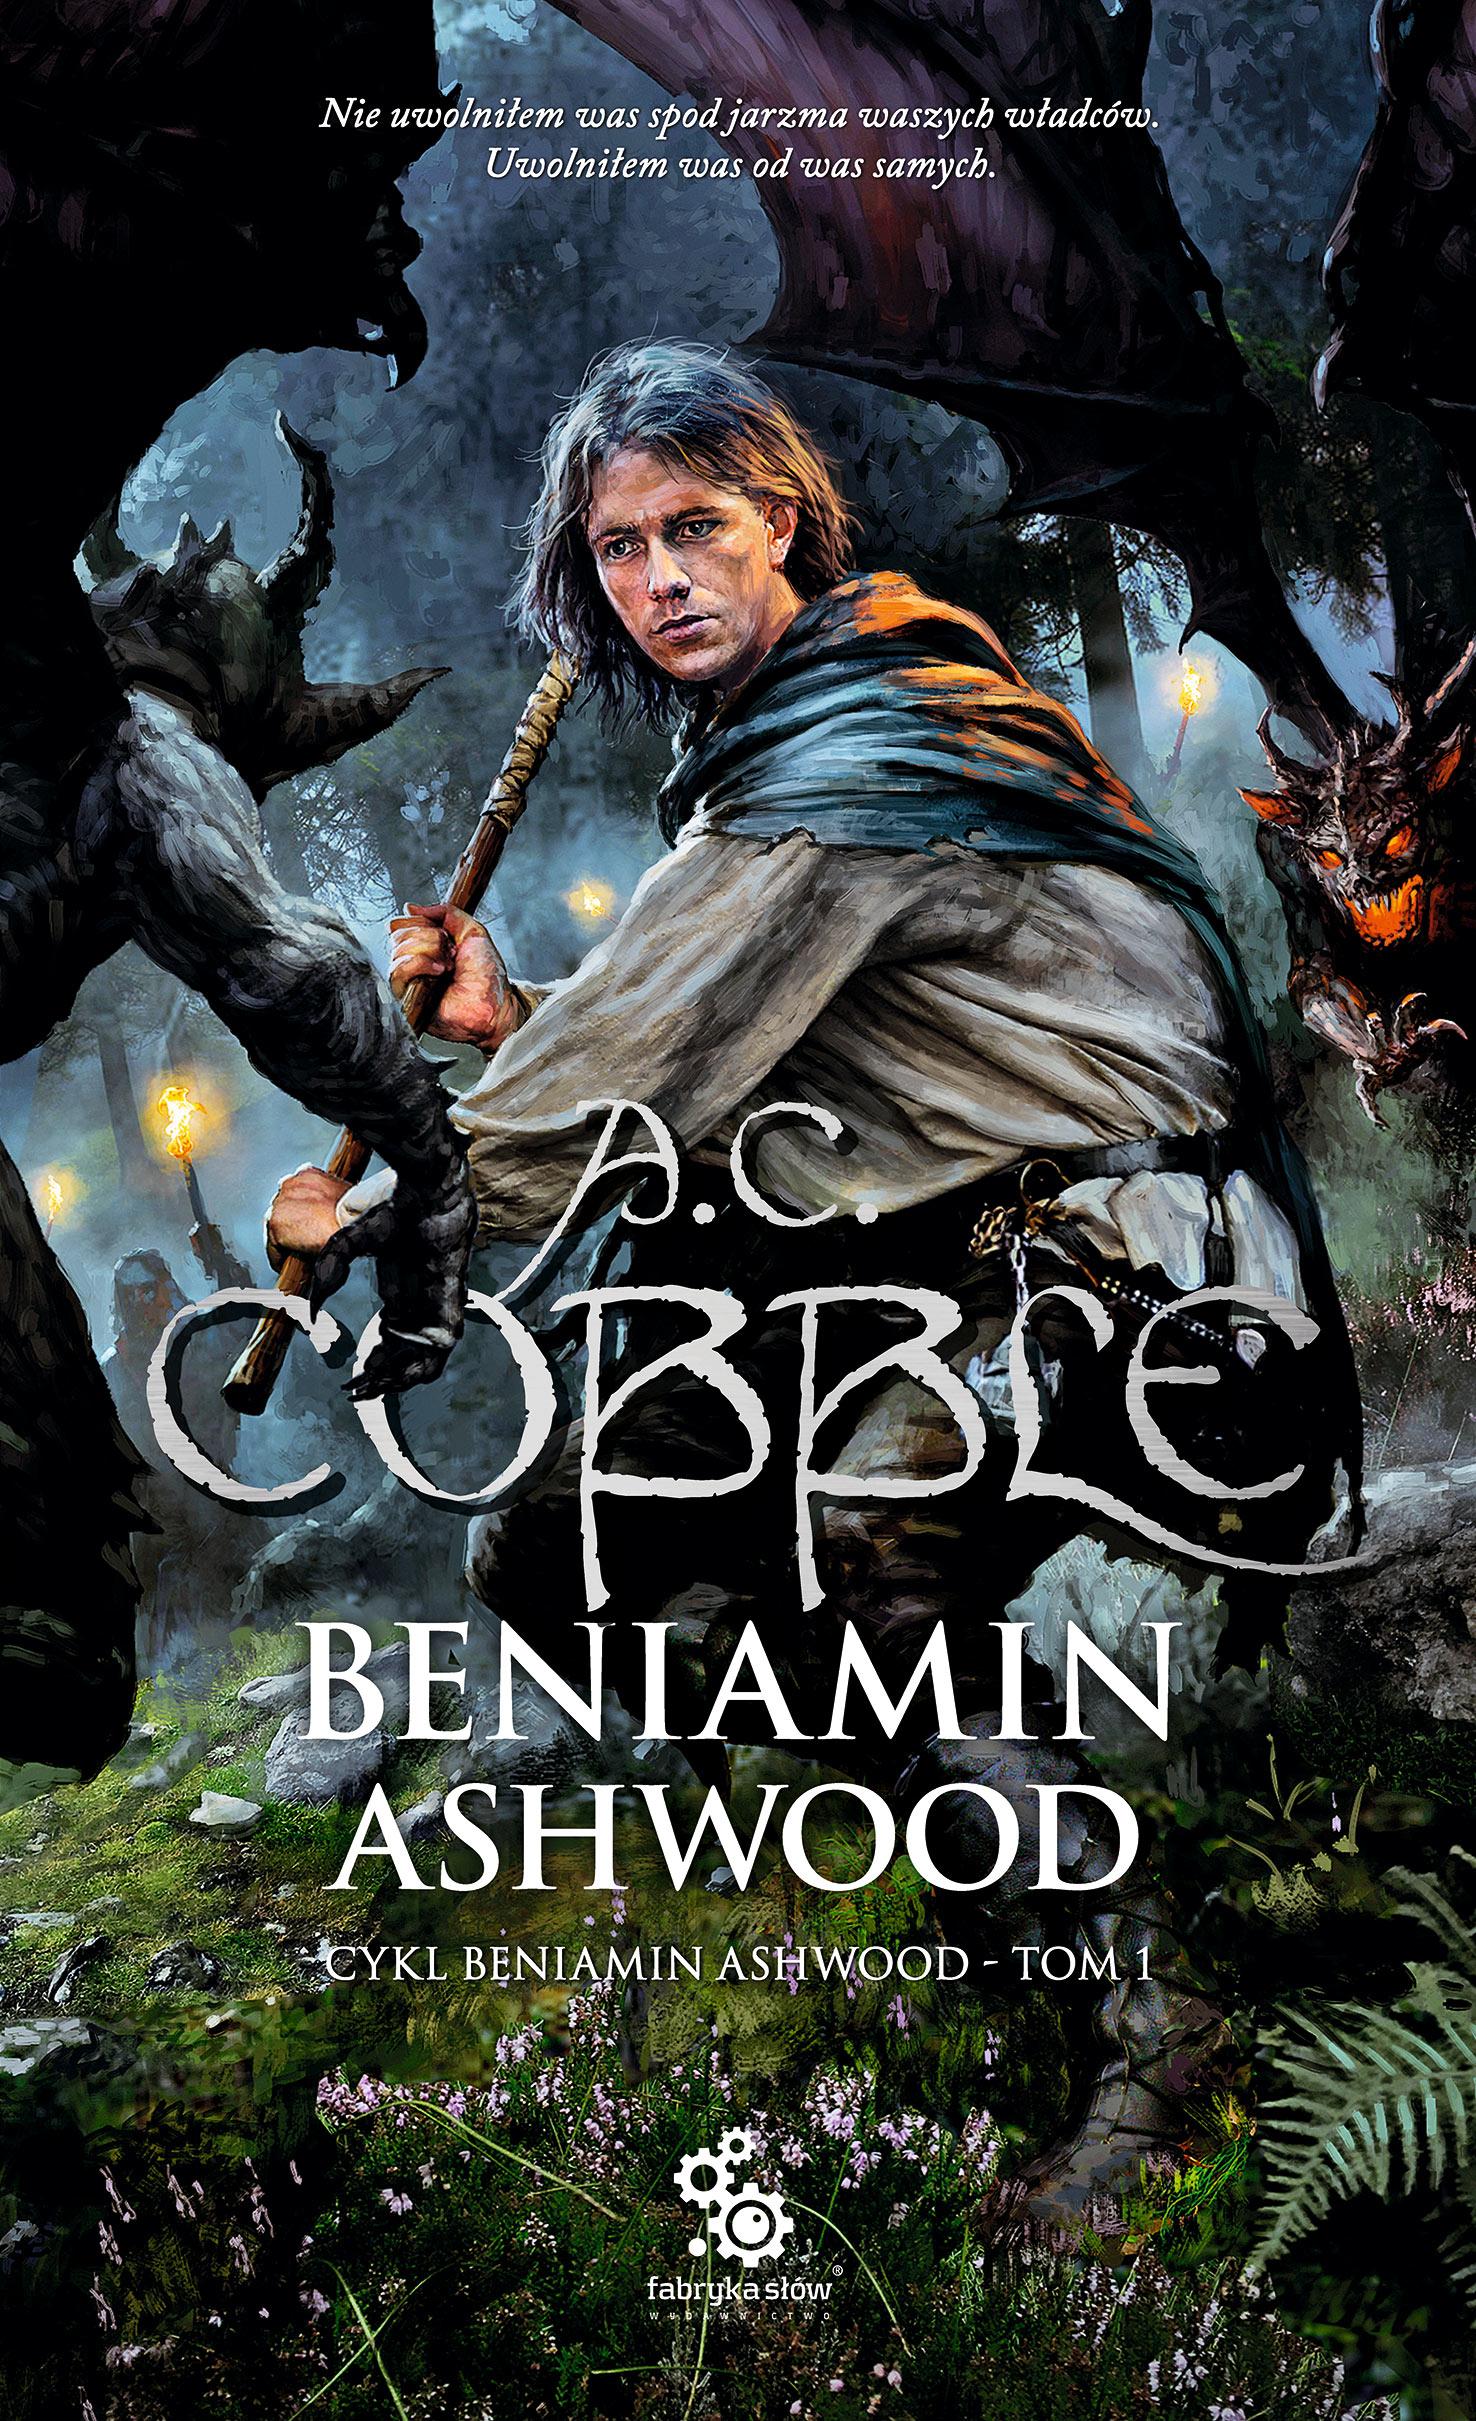 Beniamin Ashwood